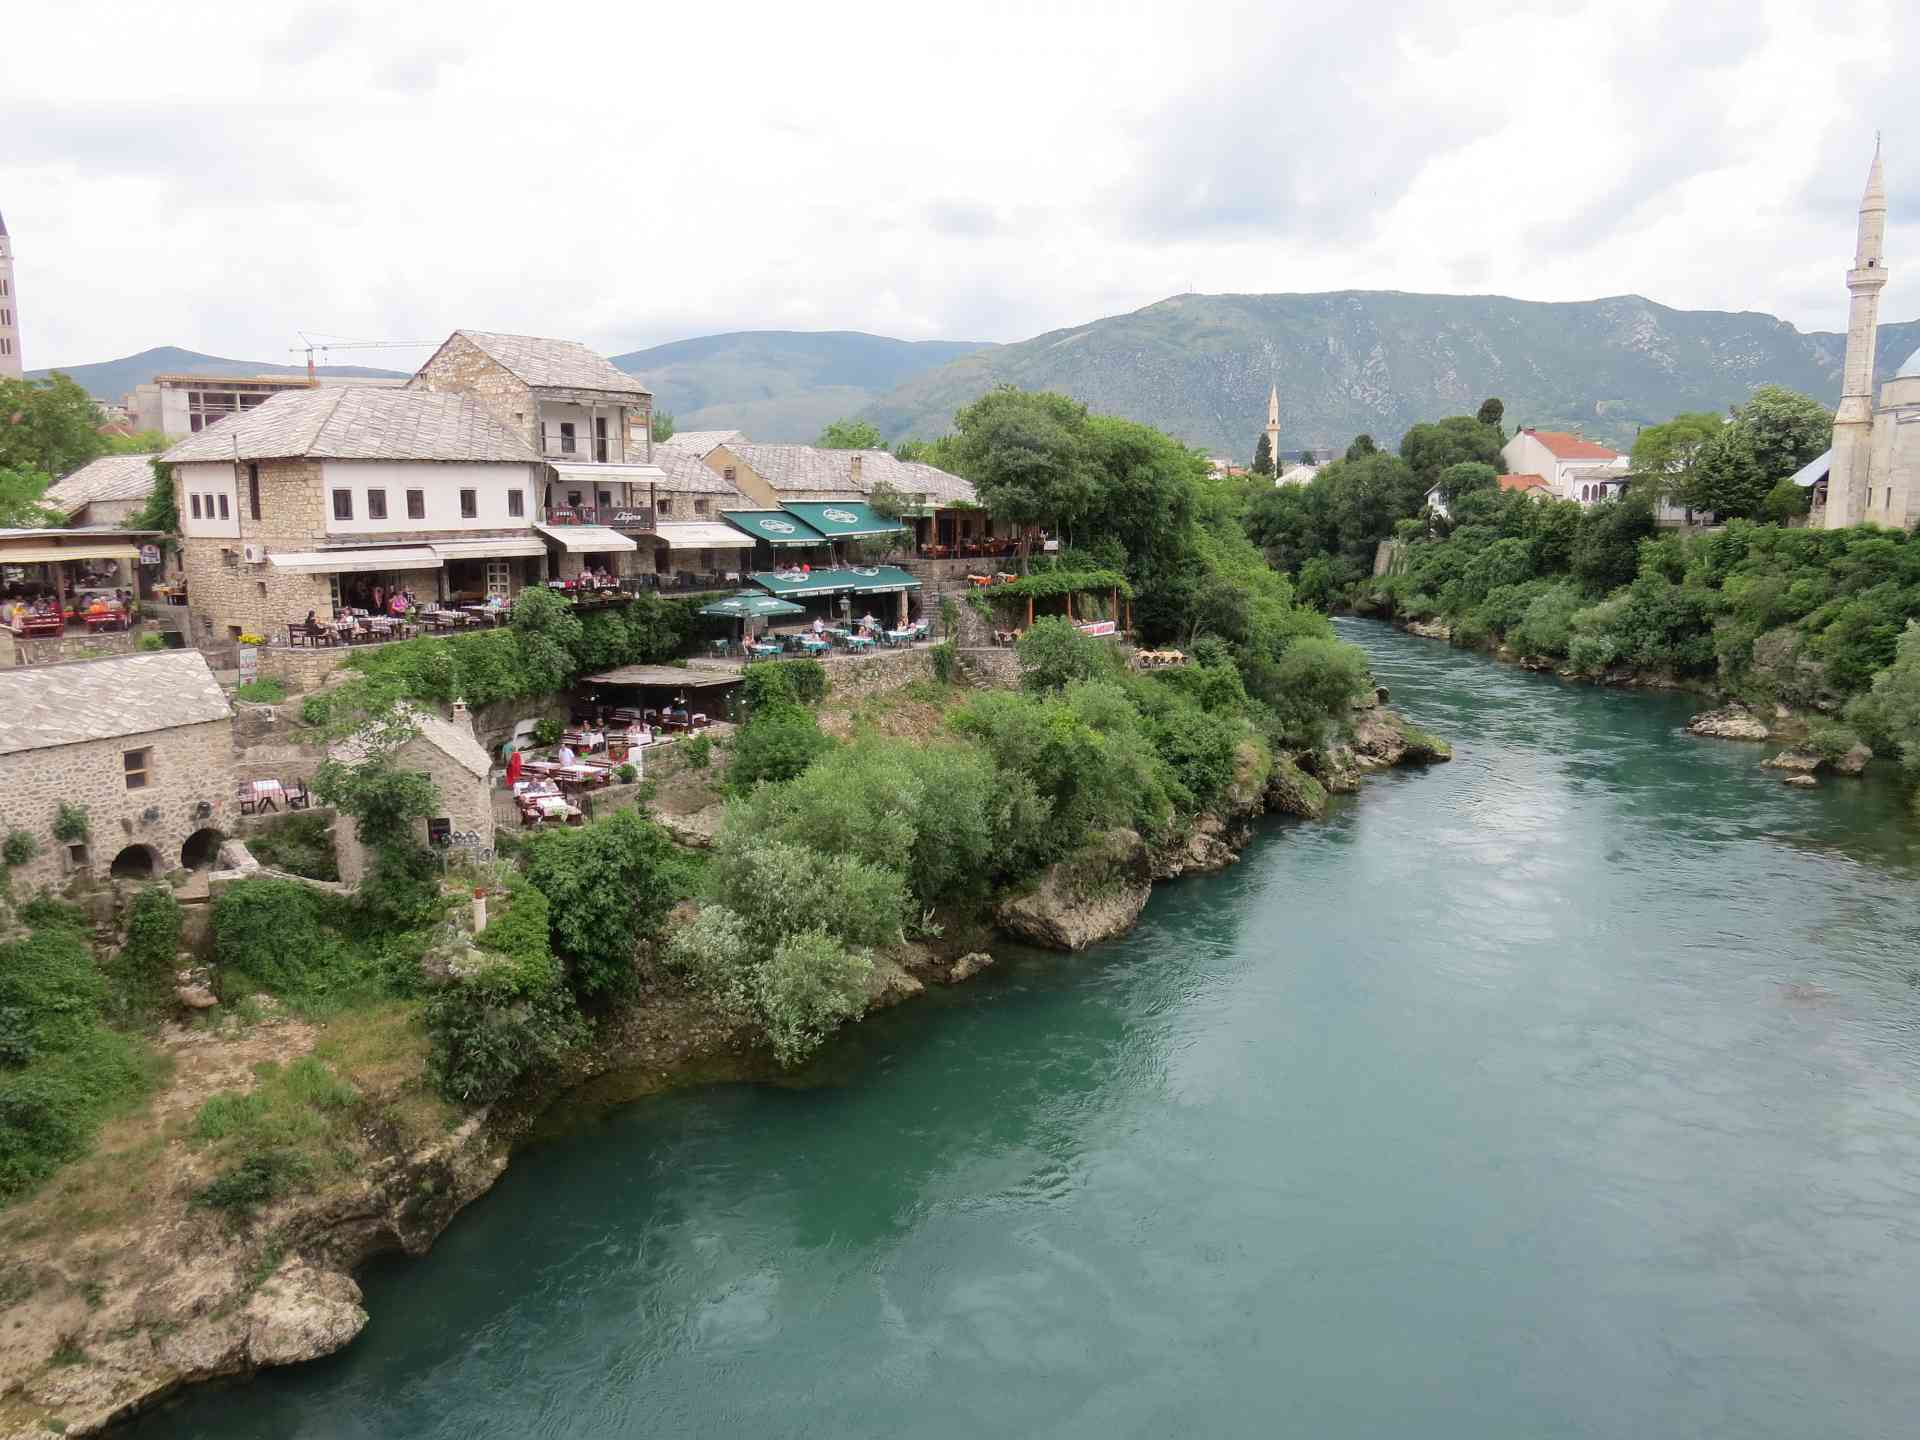 Mostar, Bosnia & Herzegovina by Adam Dickson